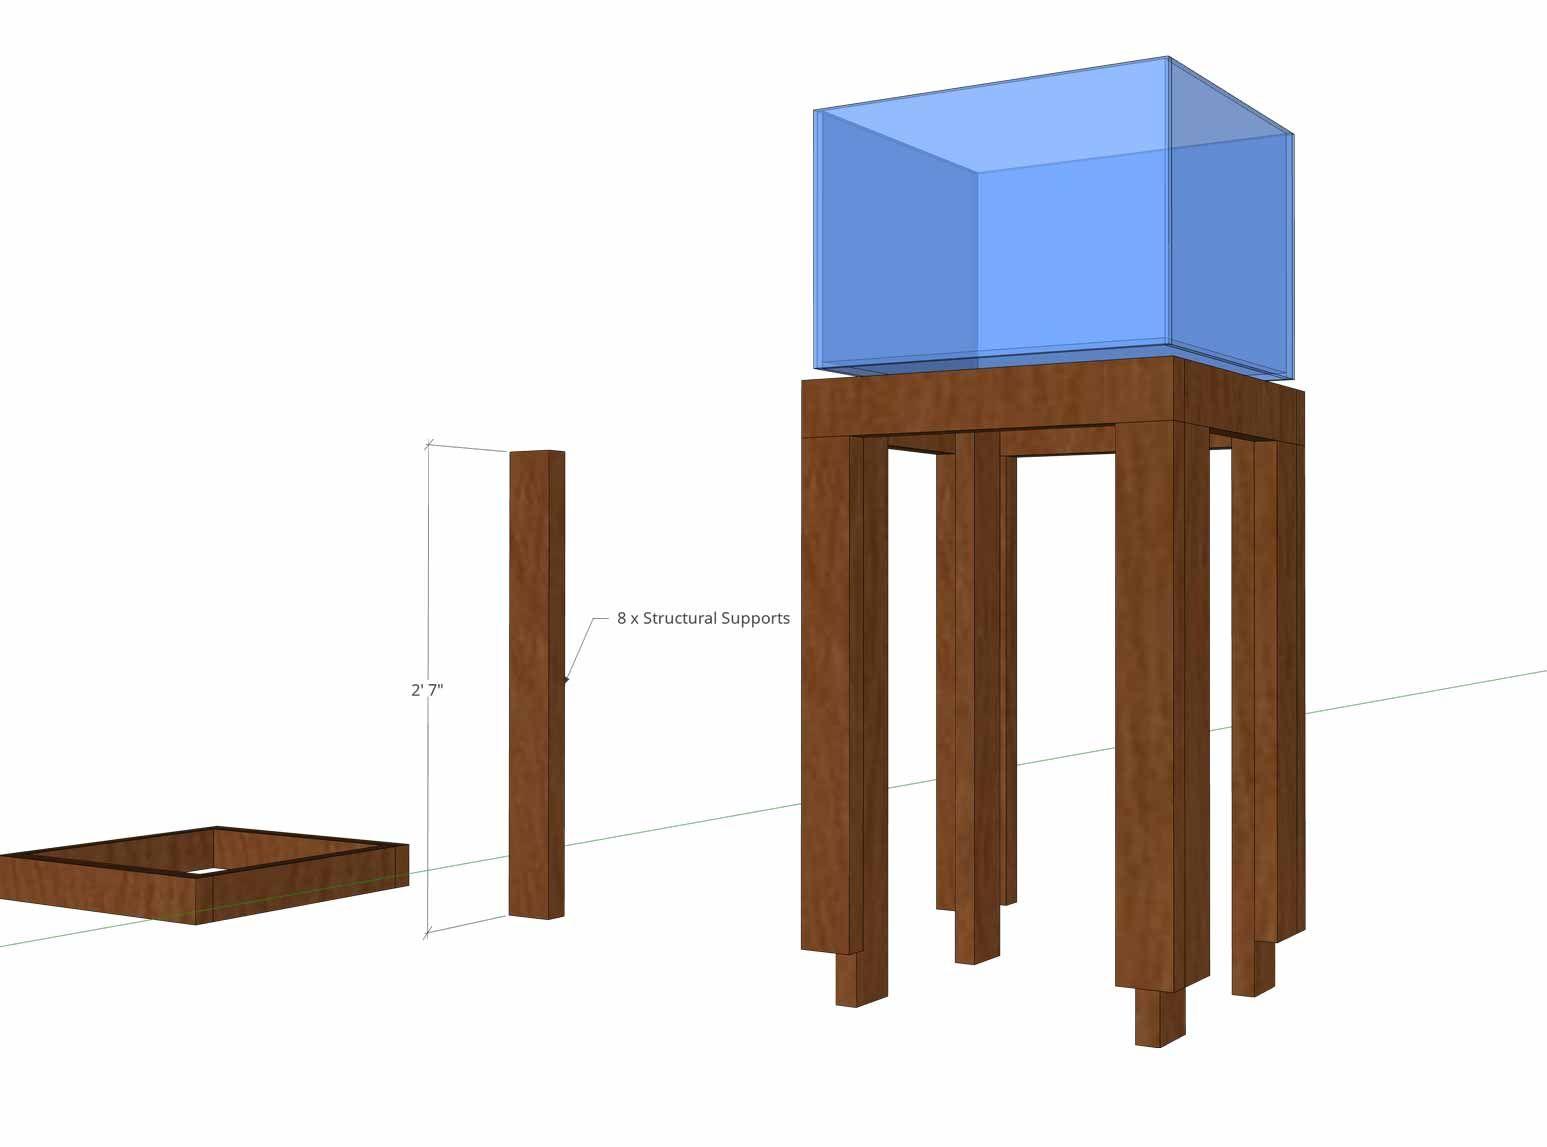 Aquarium Stand - Structural Supports